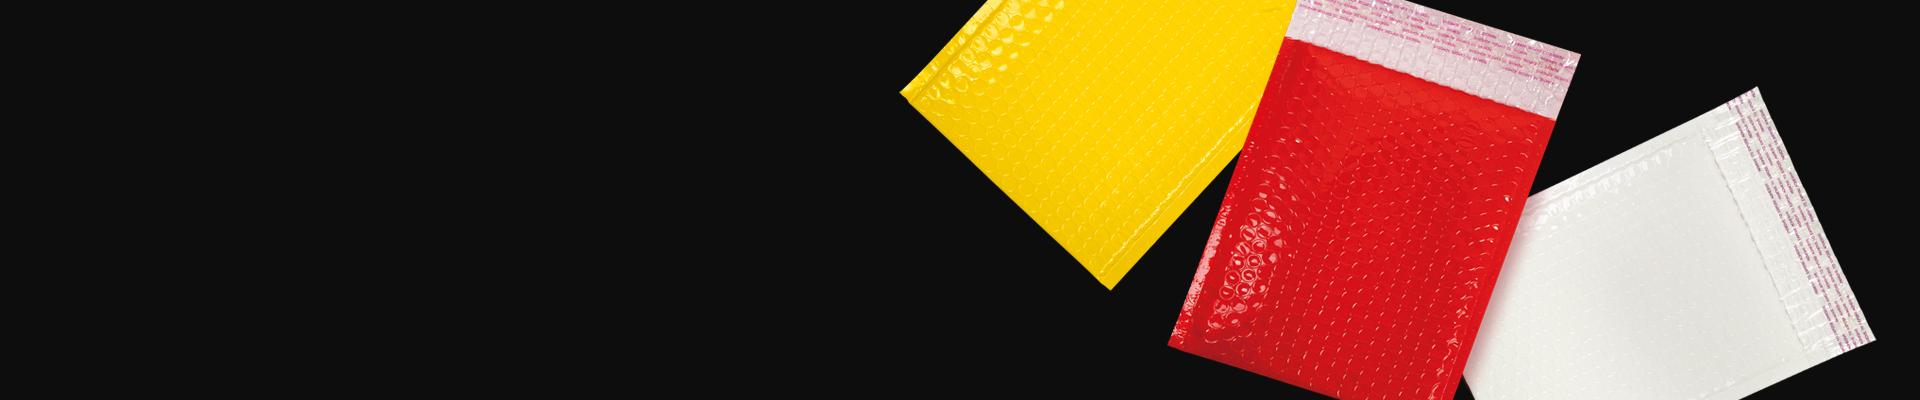 Creative Colour Neon Gloss Padded Bubble Envelopes